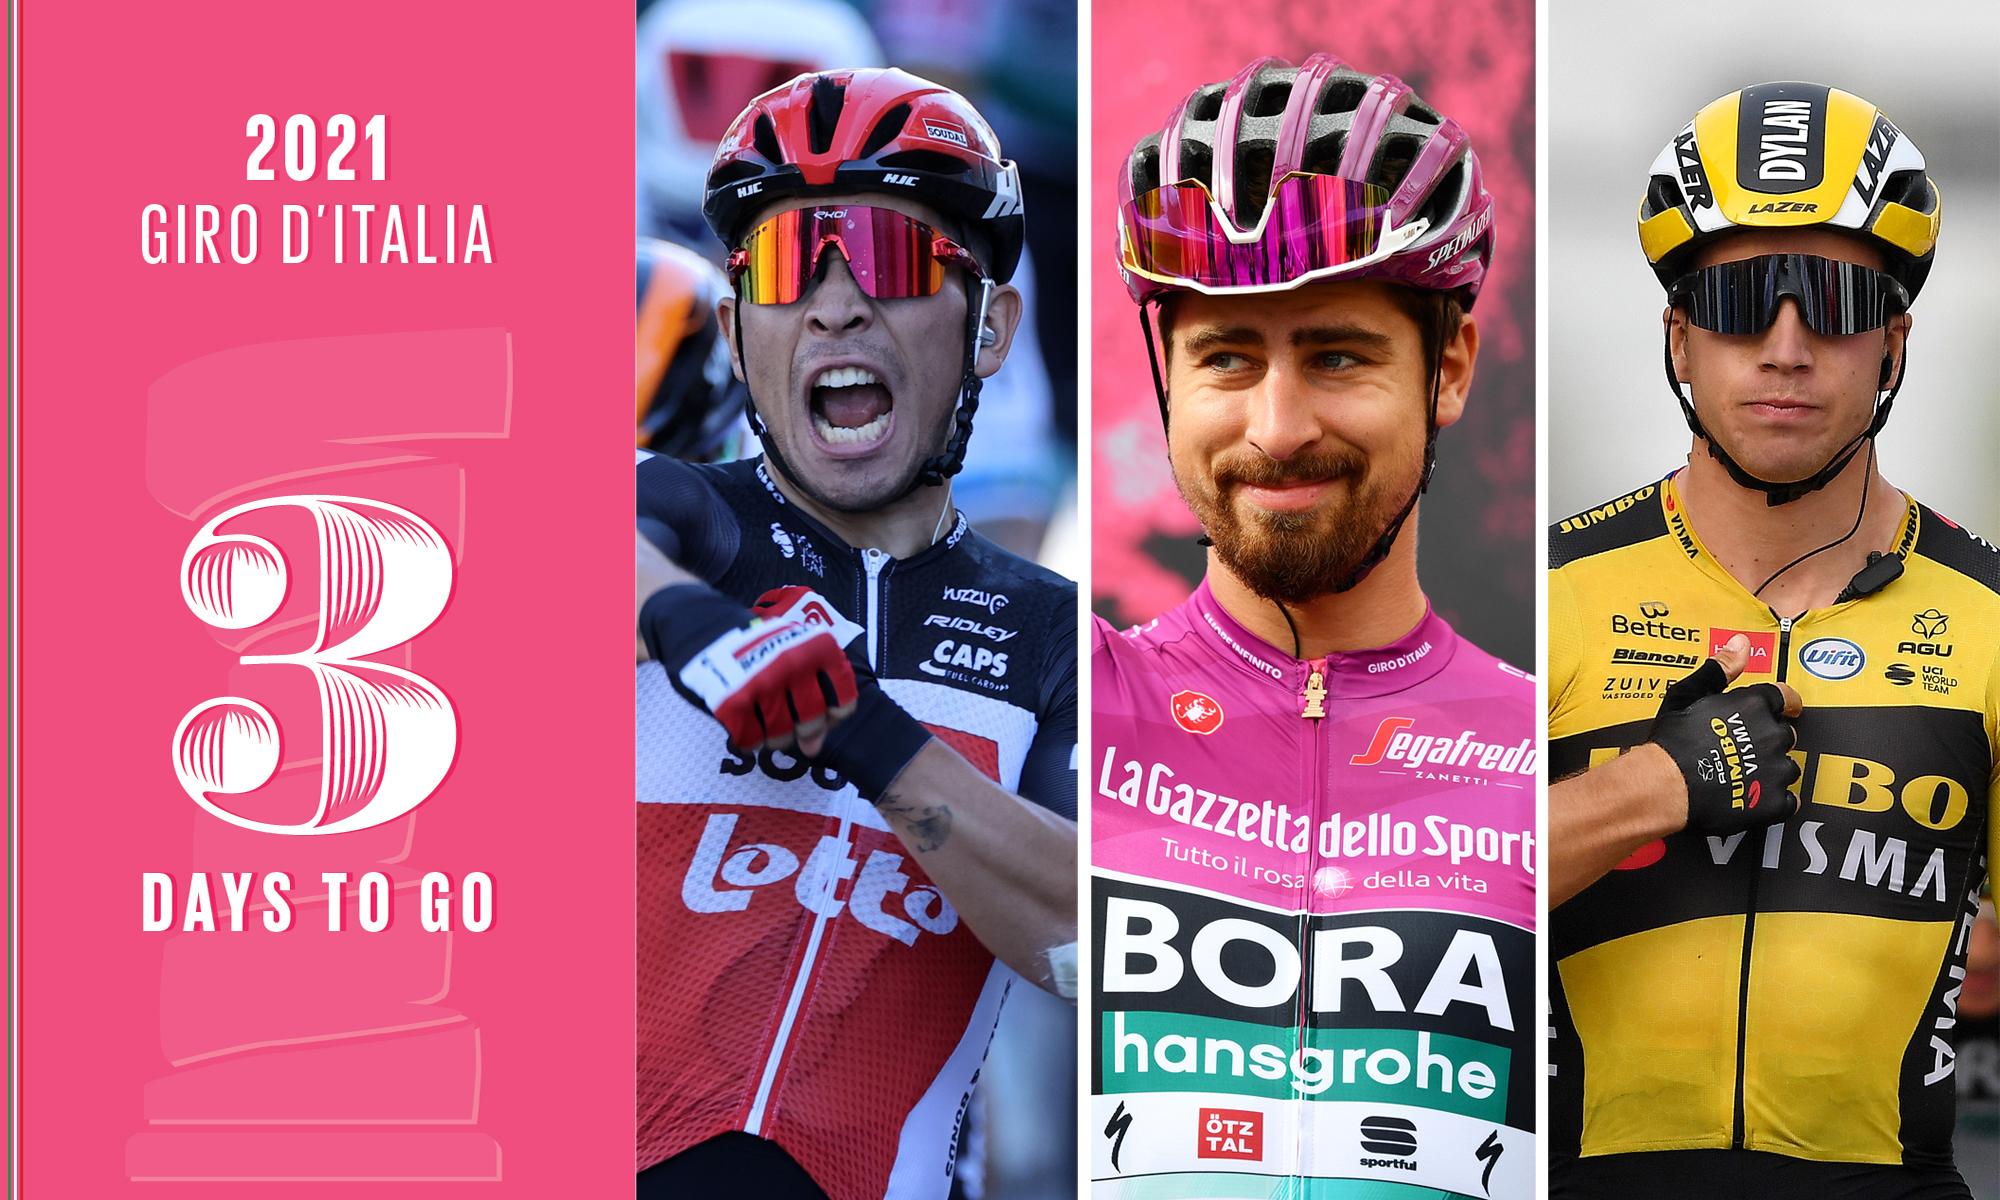 Giro d'Italia sprinters compilation 2021 Caleb Ewan (Lotto Soudal), Peter Sagan (Bora Hansgrohe) and Dylan Groenewegen (Jumbo Visma)